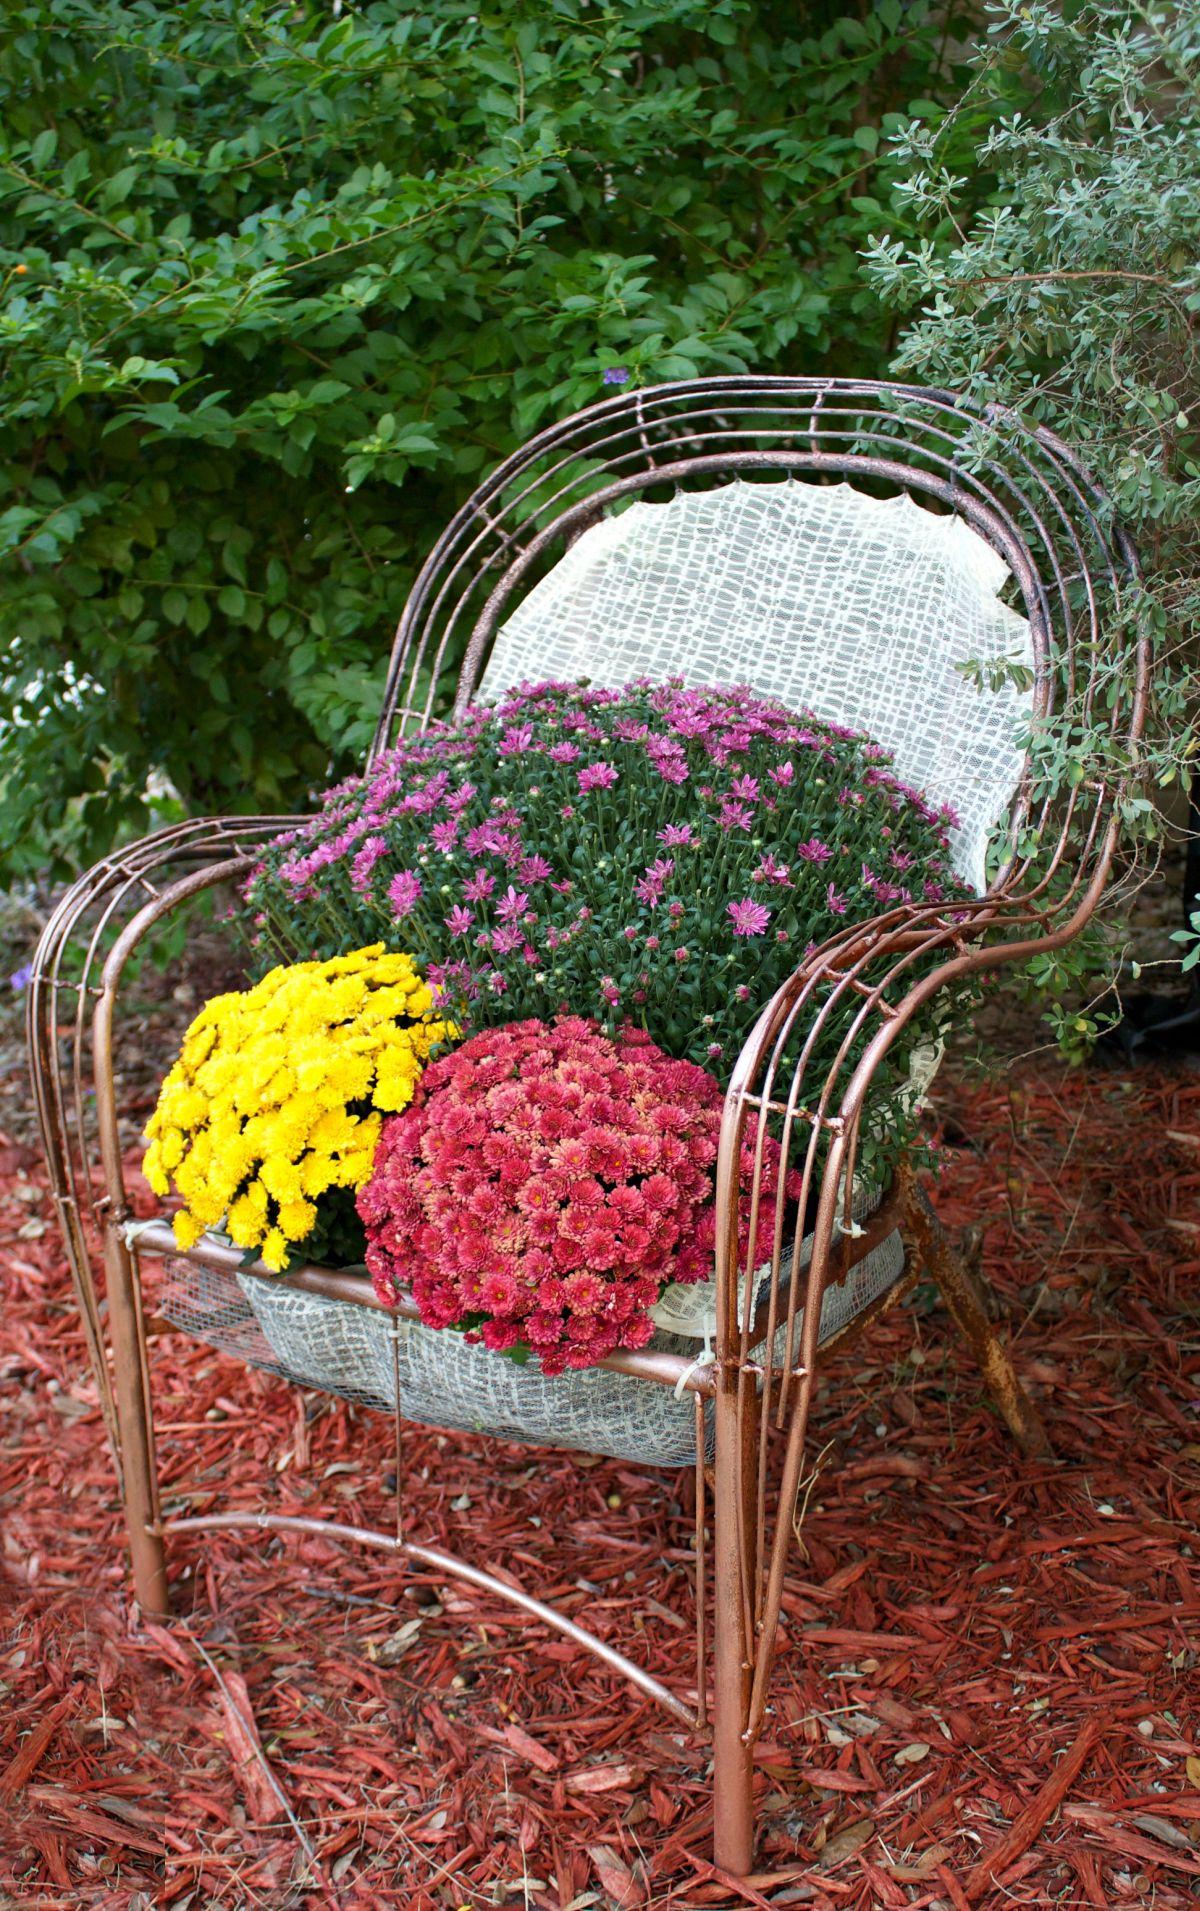 A beautiful planter chair